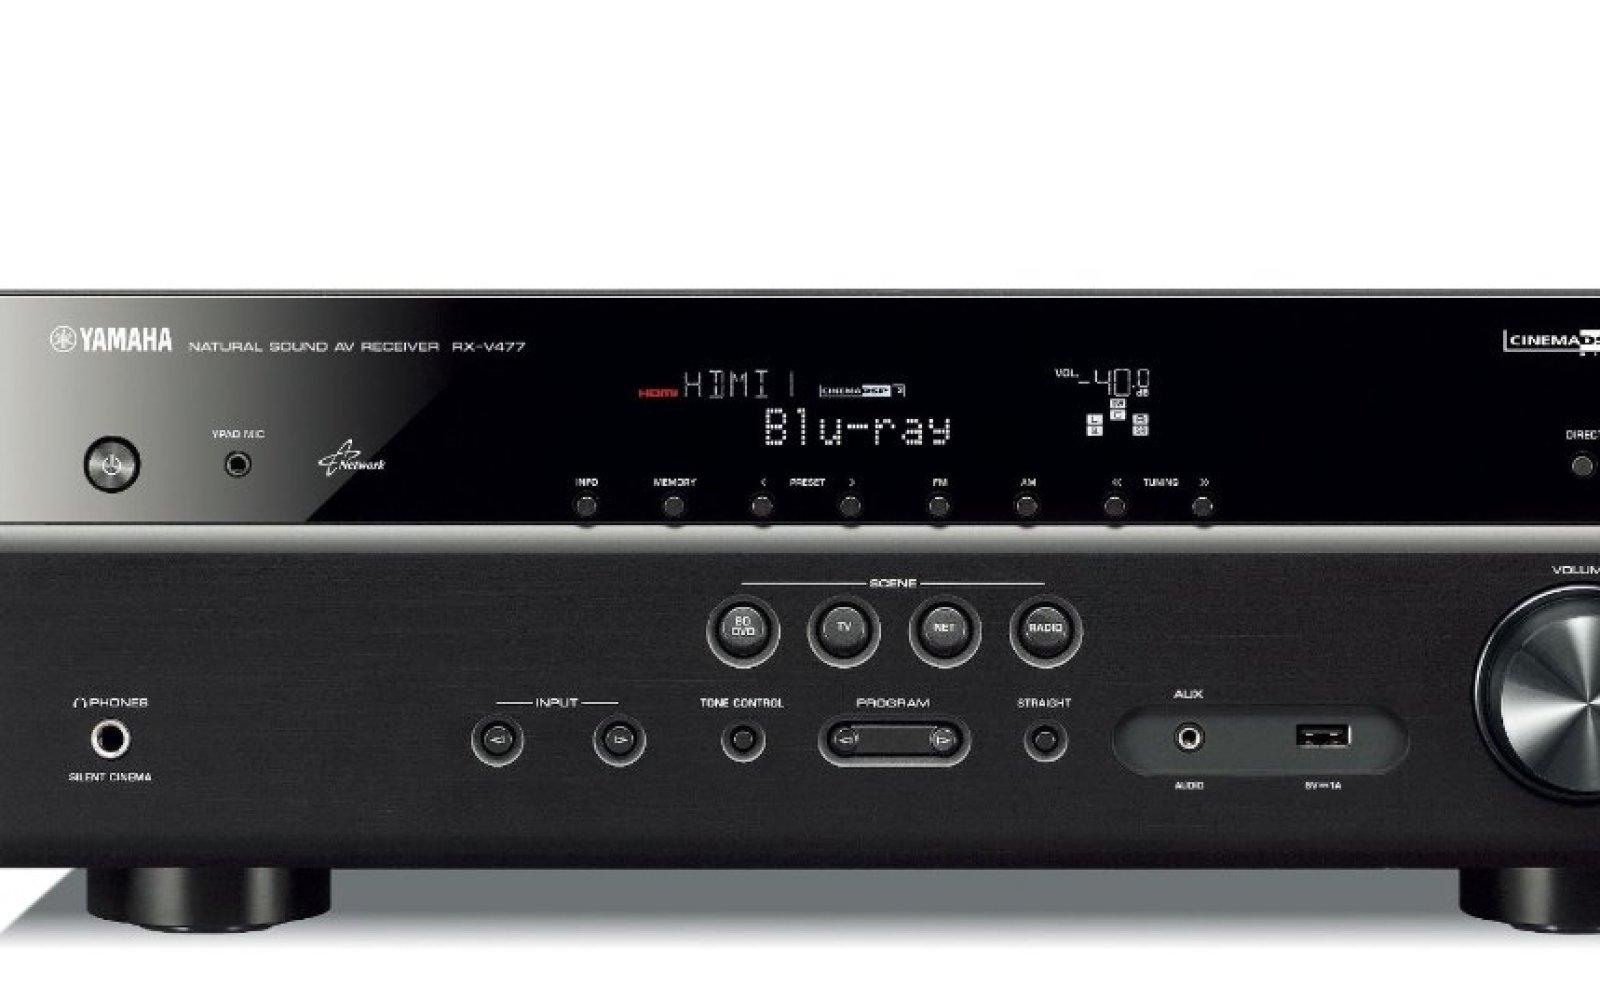 A/V Receivers: Yamaha (RX-V477) w/ Airplay $300 (orig. $450), Yamaha (R-S201BL) Natural Sound $130 (orig. $180), more